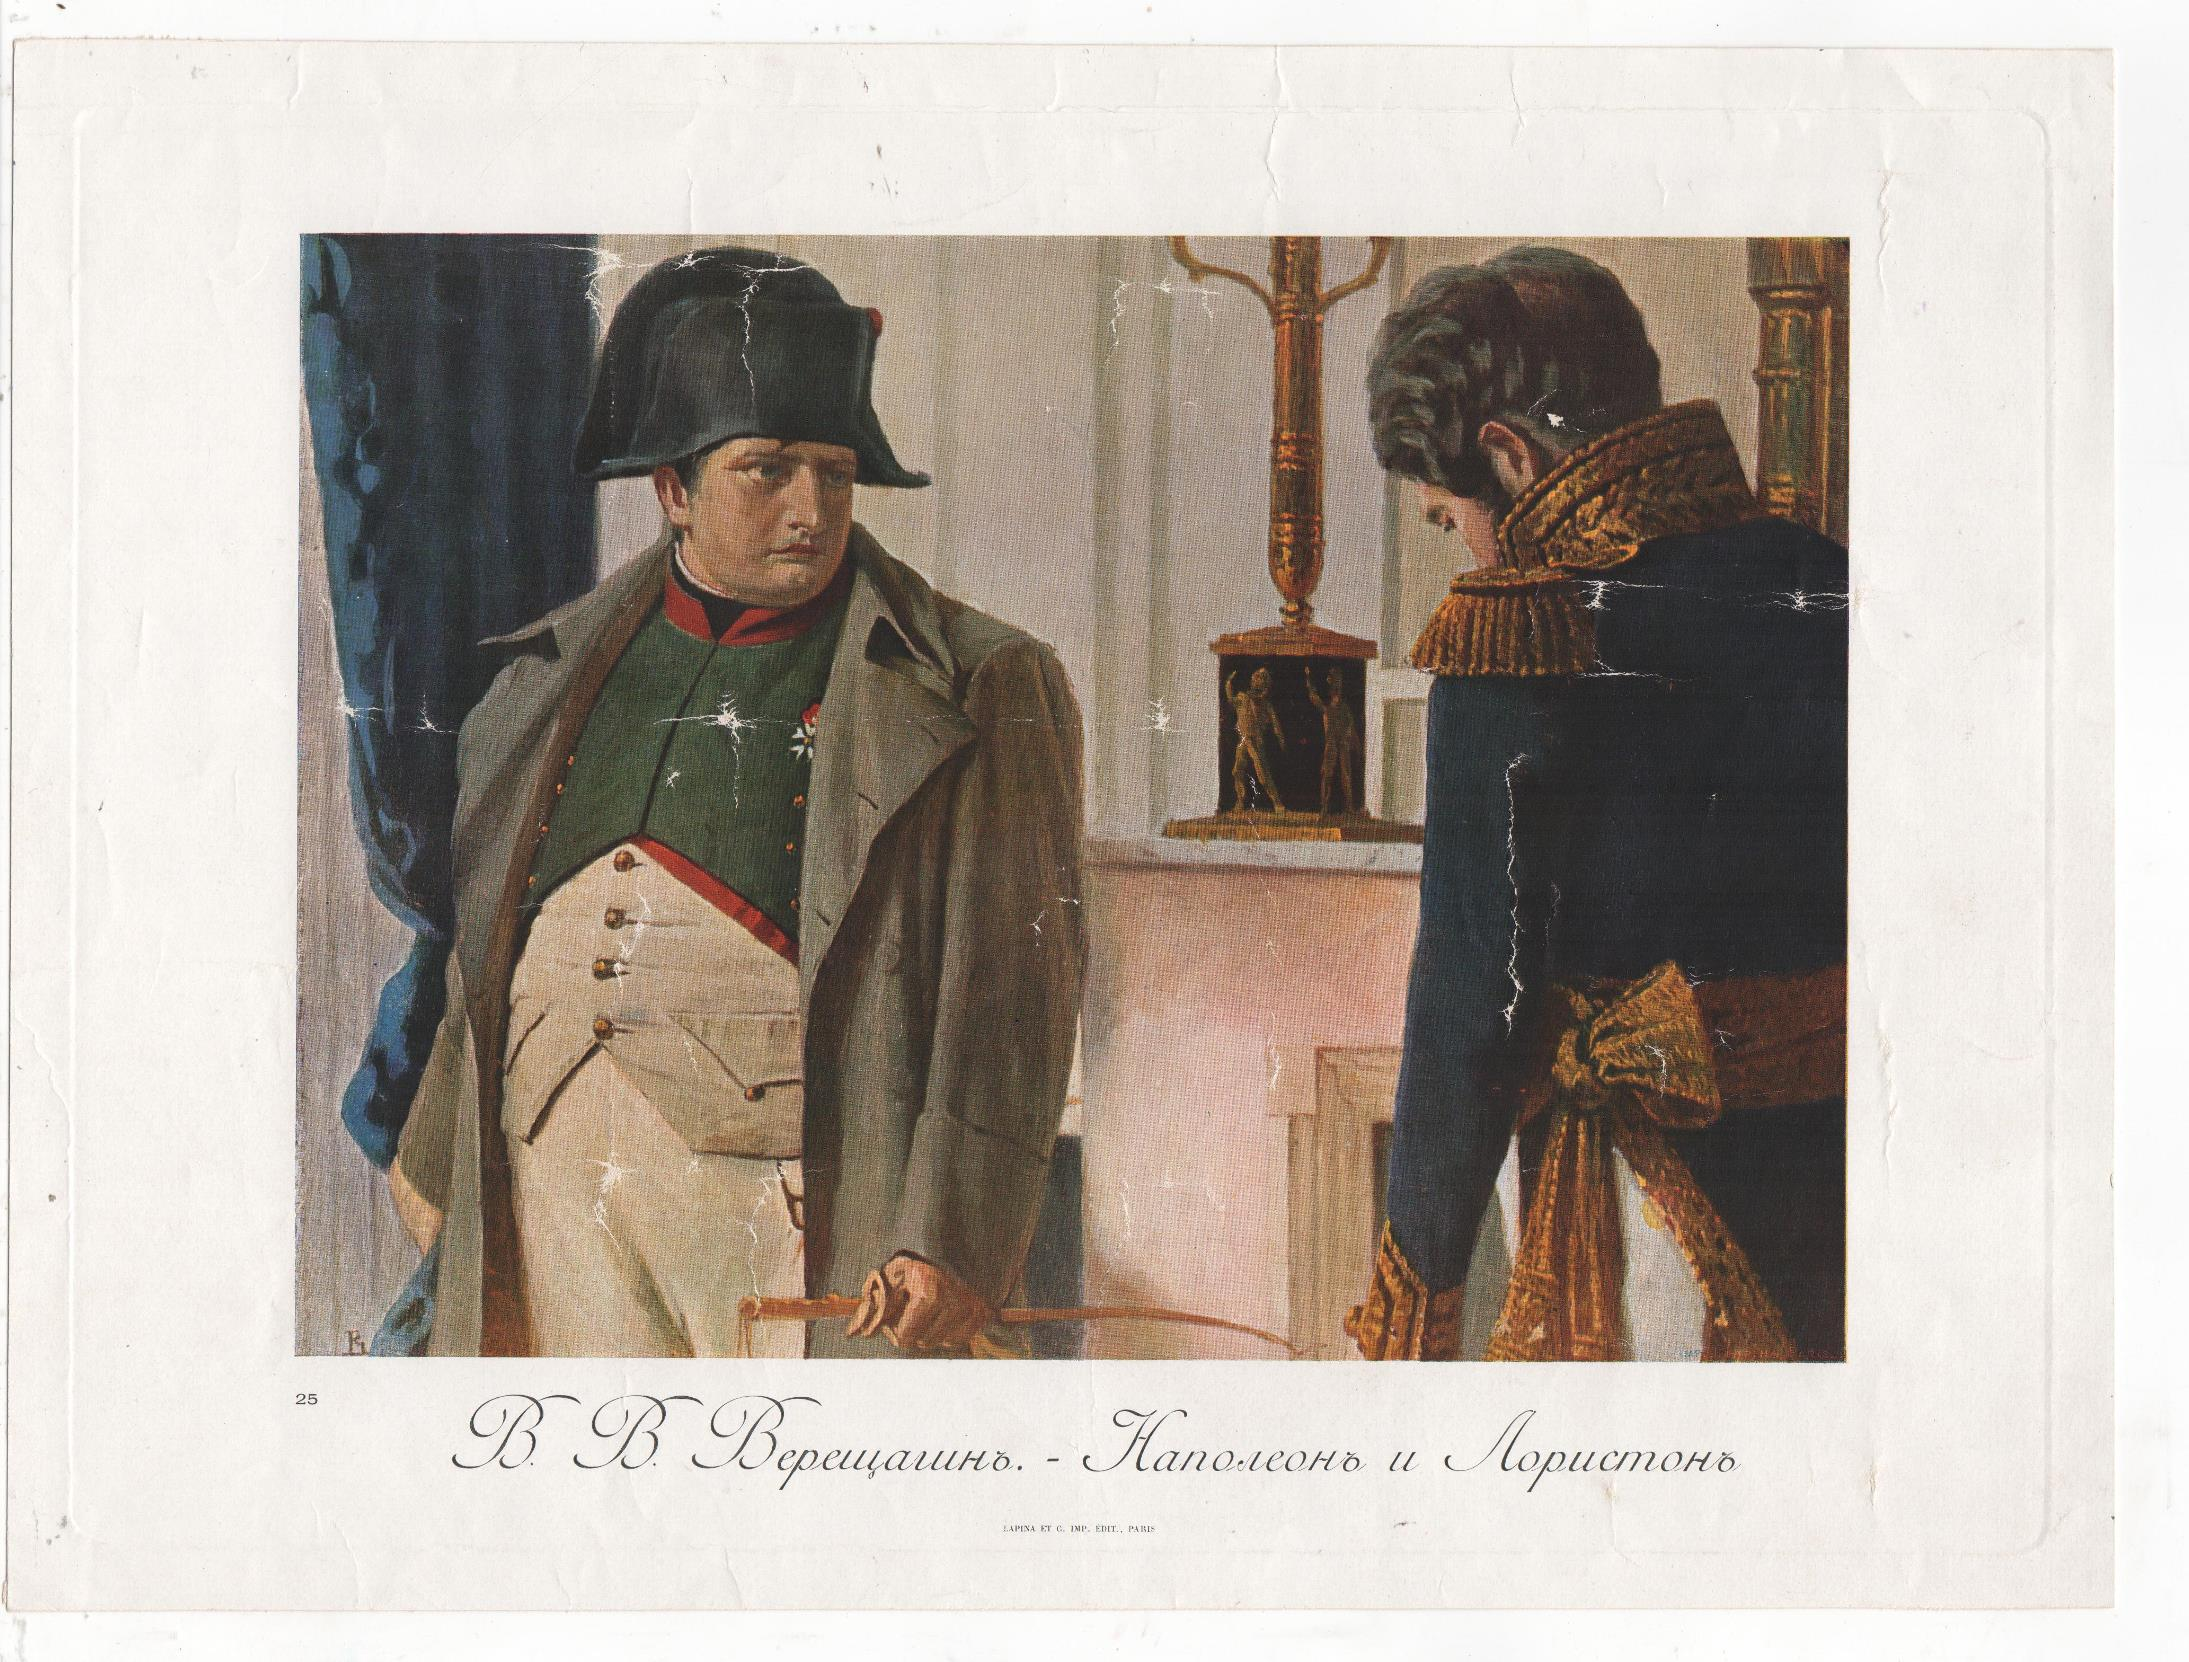 Репродукція В. В. Верещагіна «Наполеонъ и Лористонъ». Книга «Отечественная война 1812»